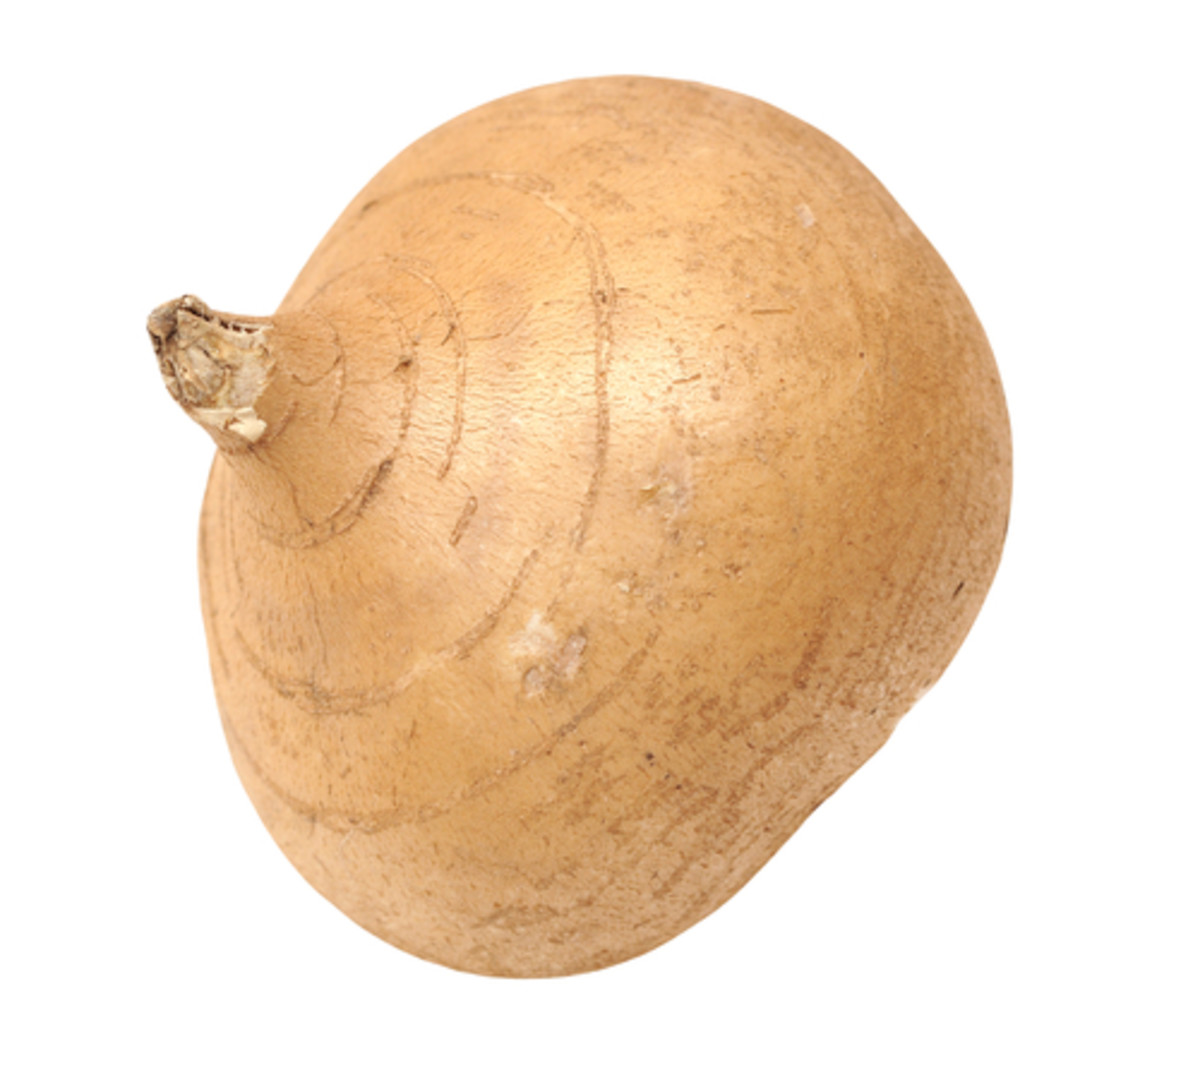 jicama season